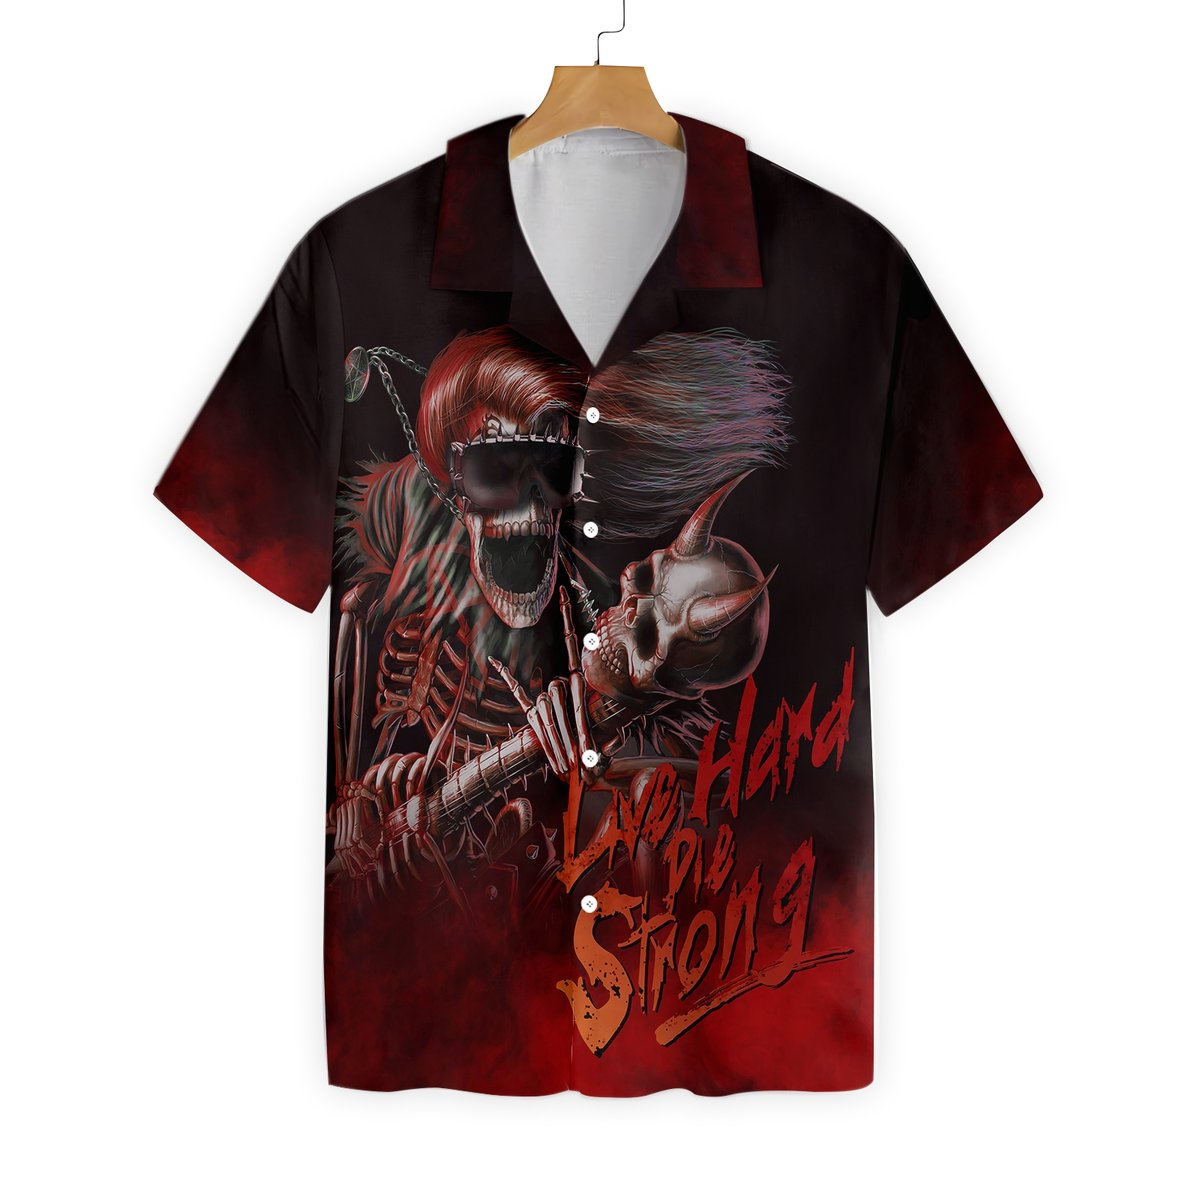 Live Hard Die Strong Burning Guitar Hawaiian Shirt 2